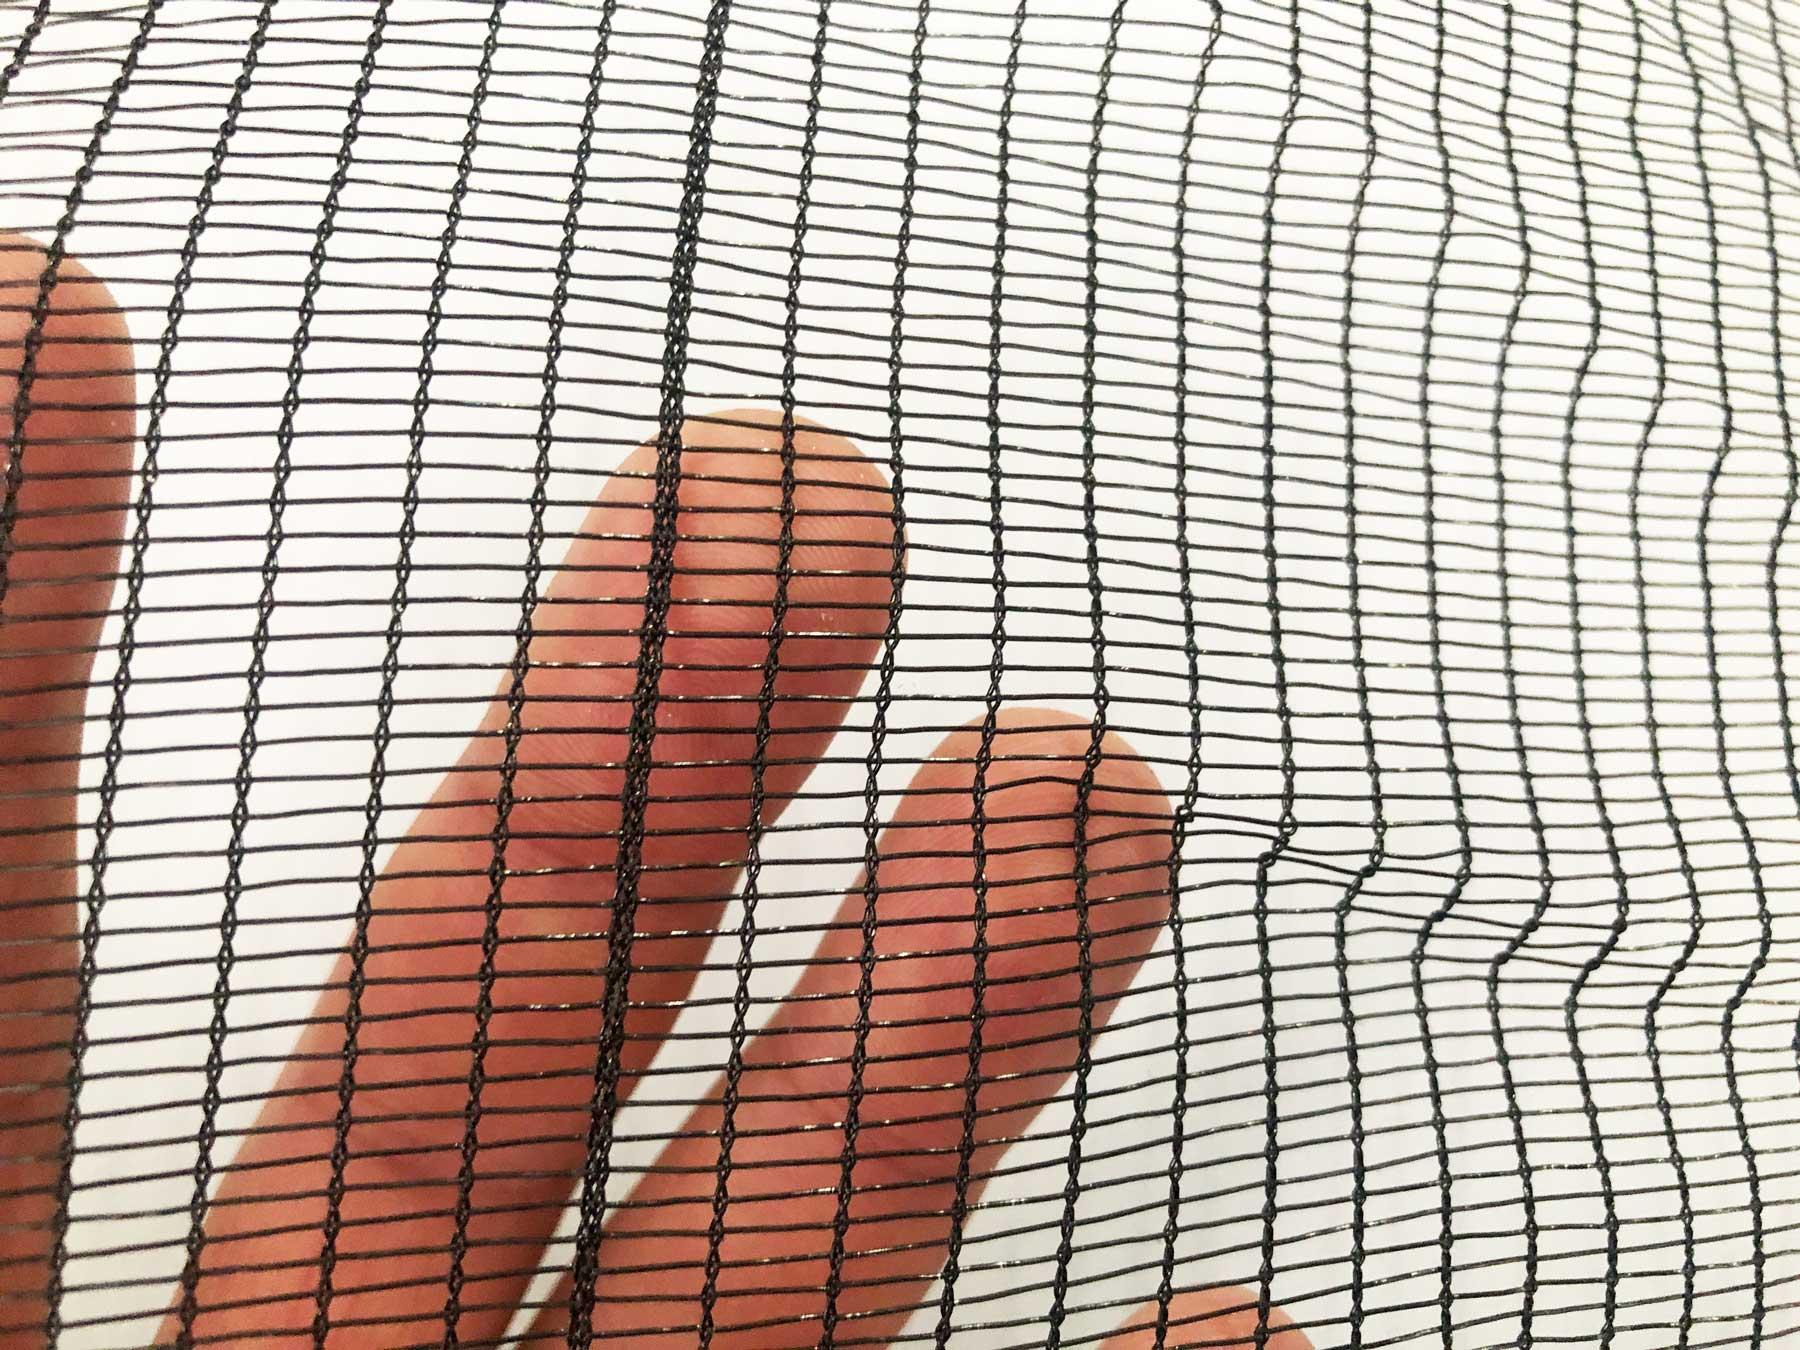 Tela Sombrite Nylon Monofilamento com Giro Inglês 50% 3x35